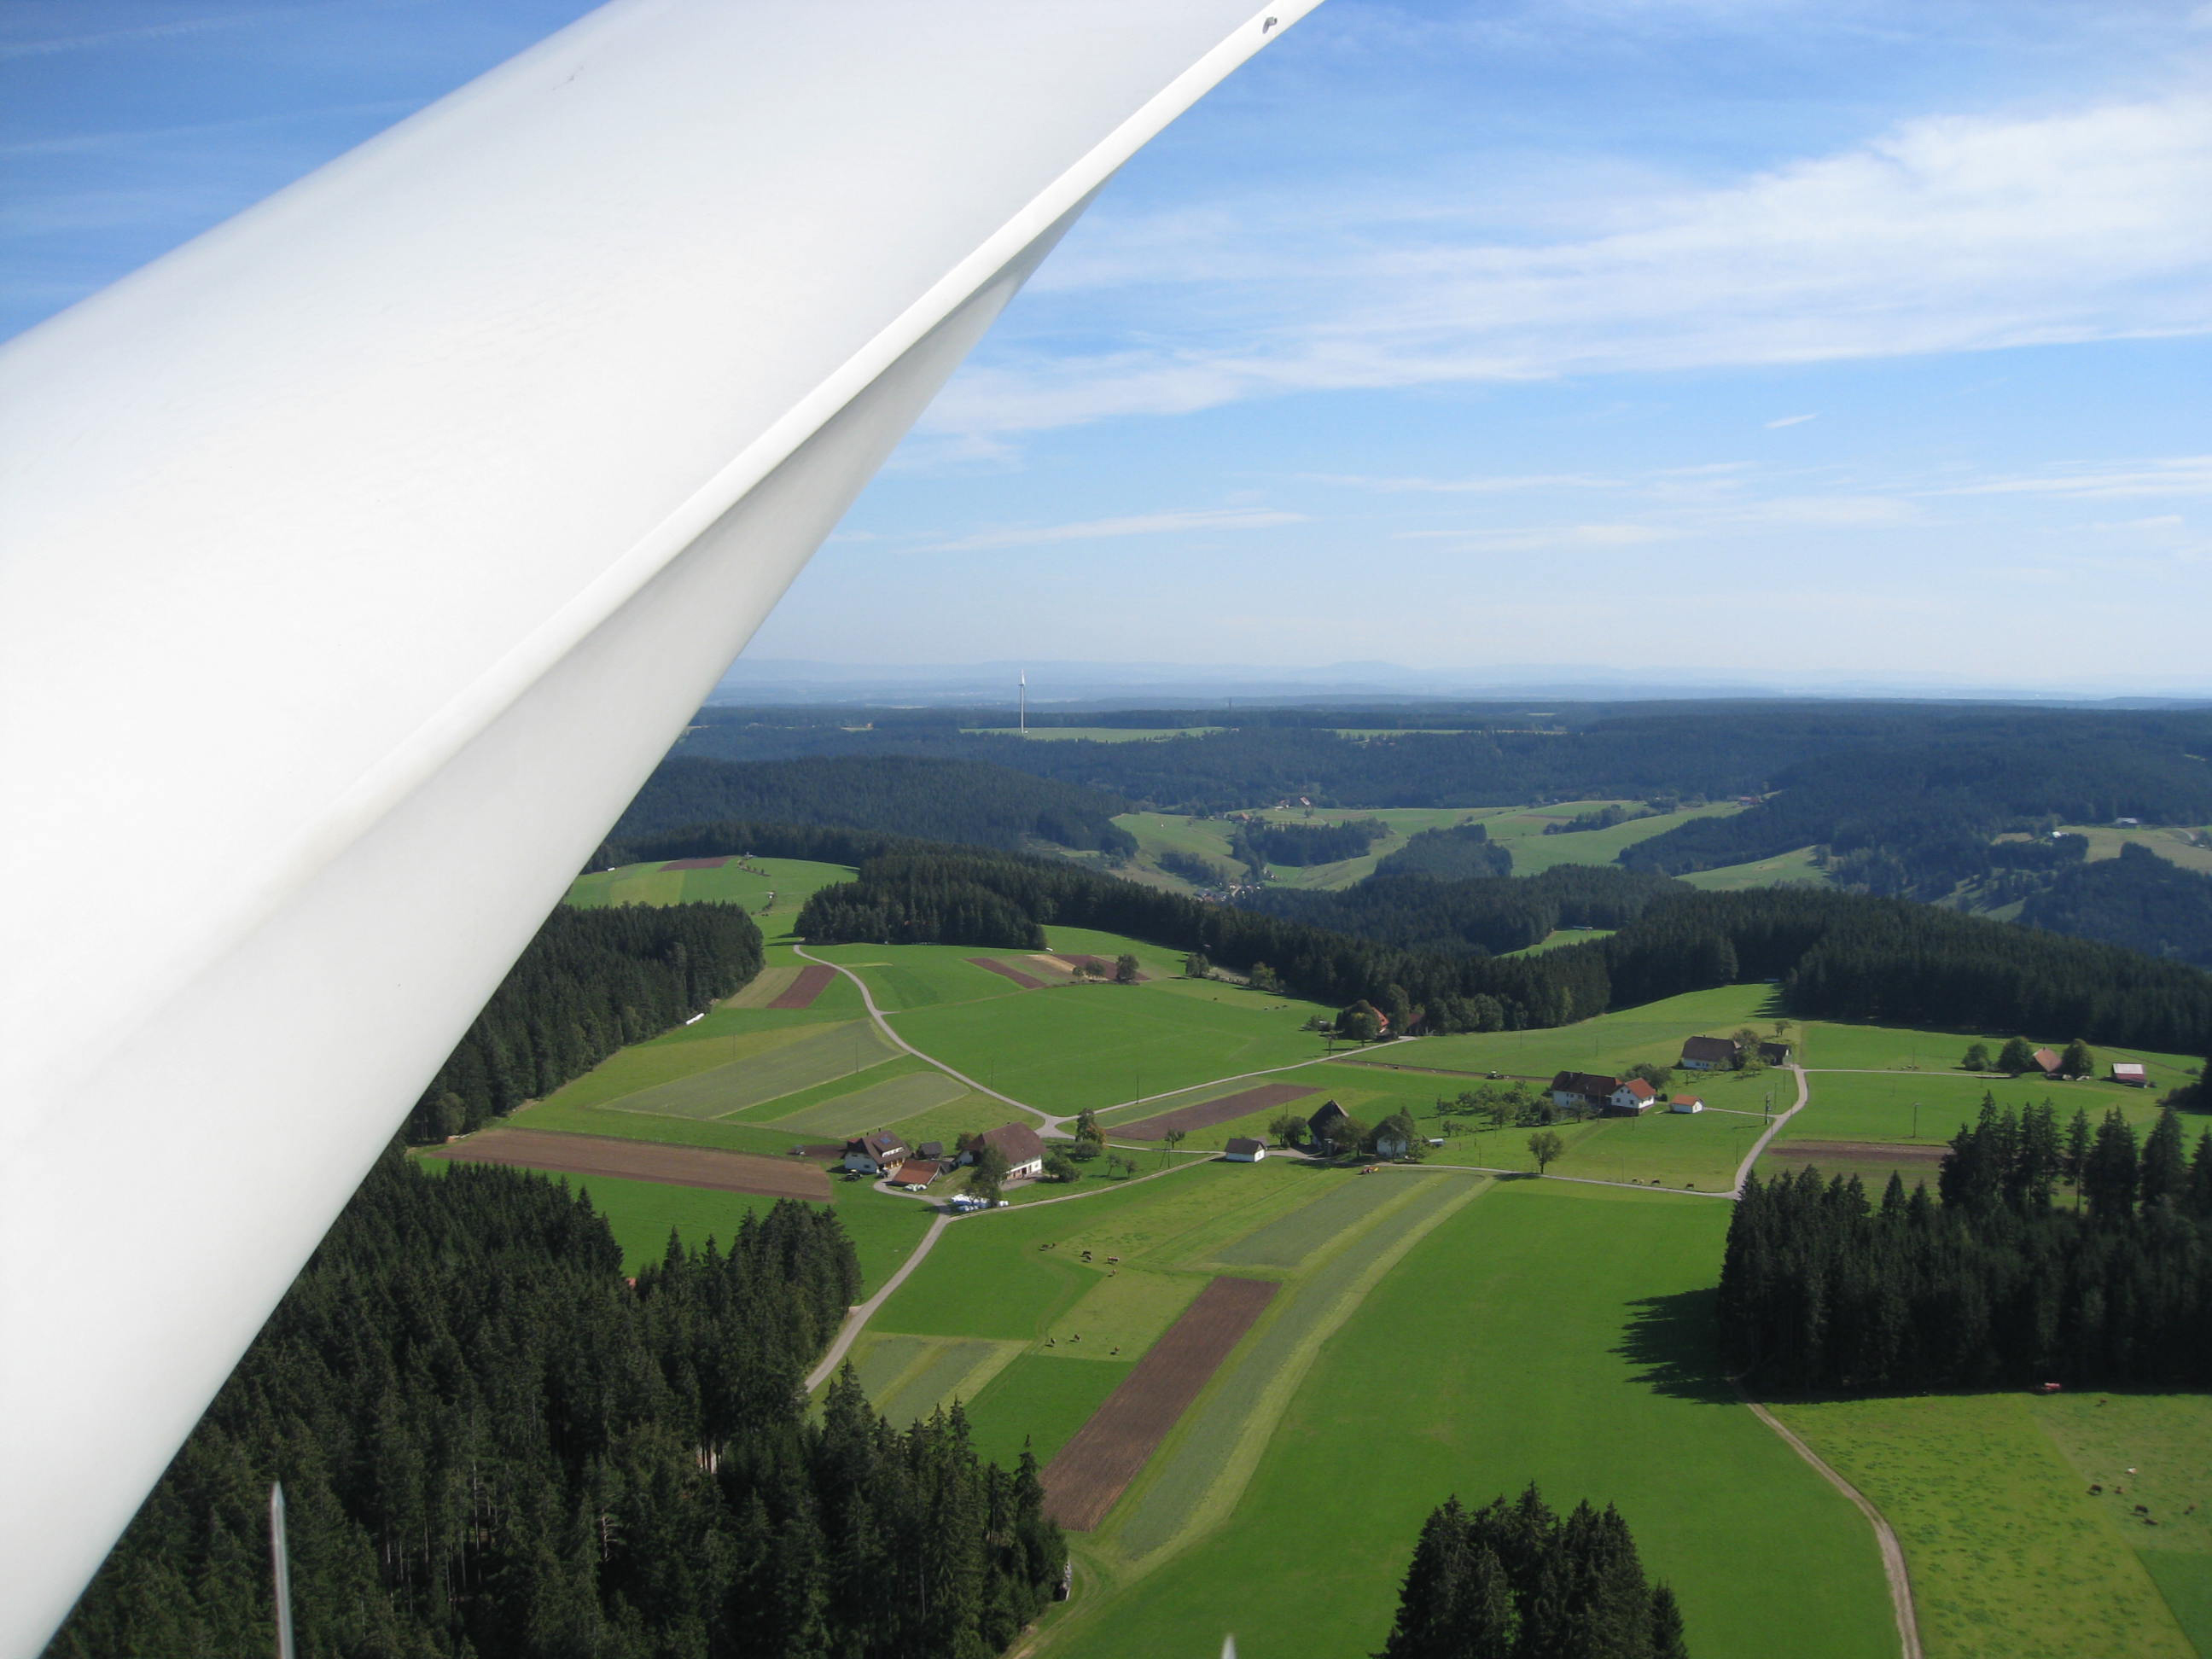 Bild Rotorblatt Windkraftanlage